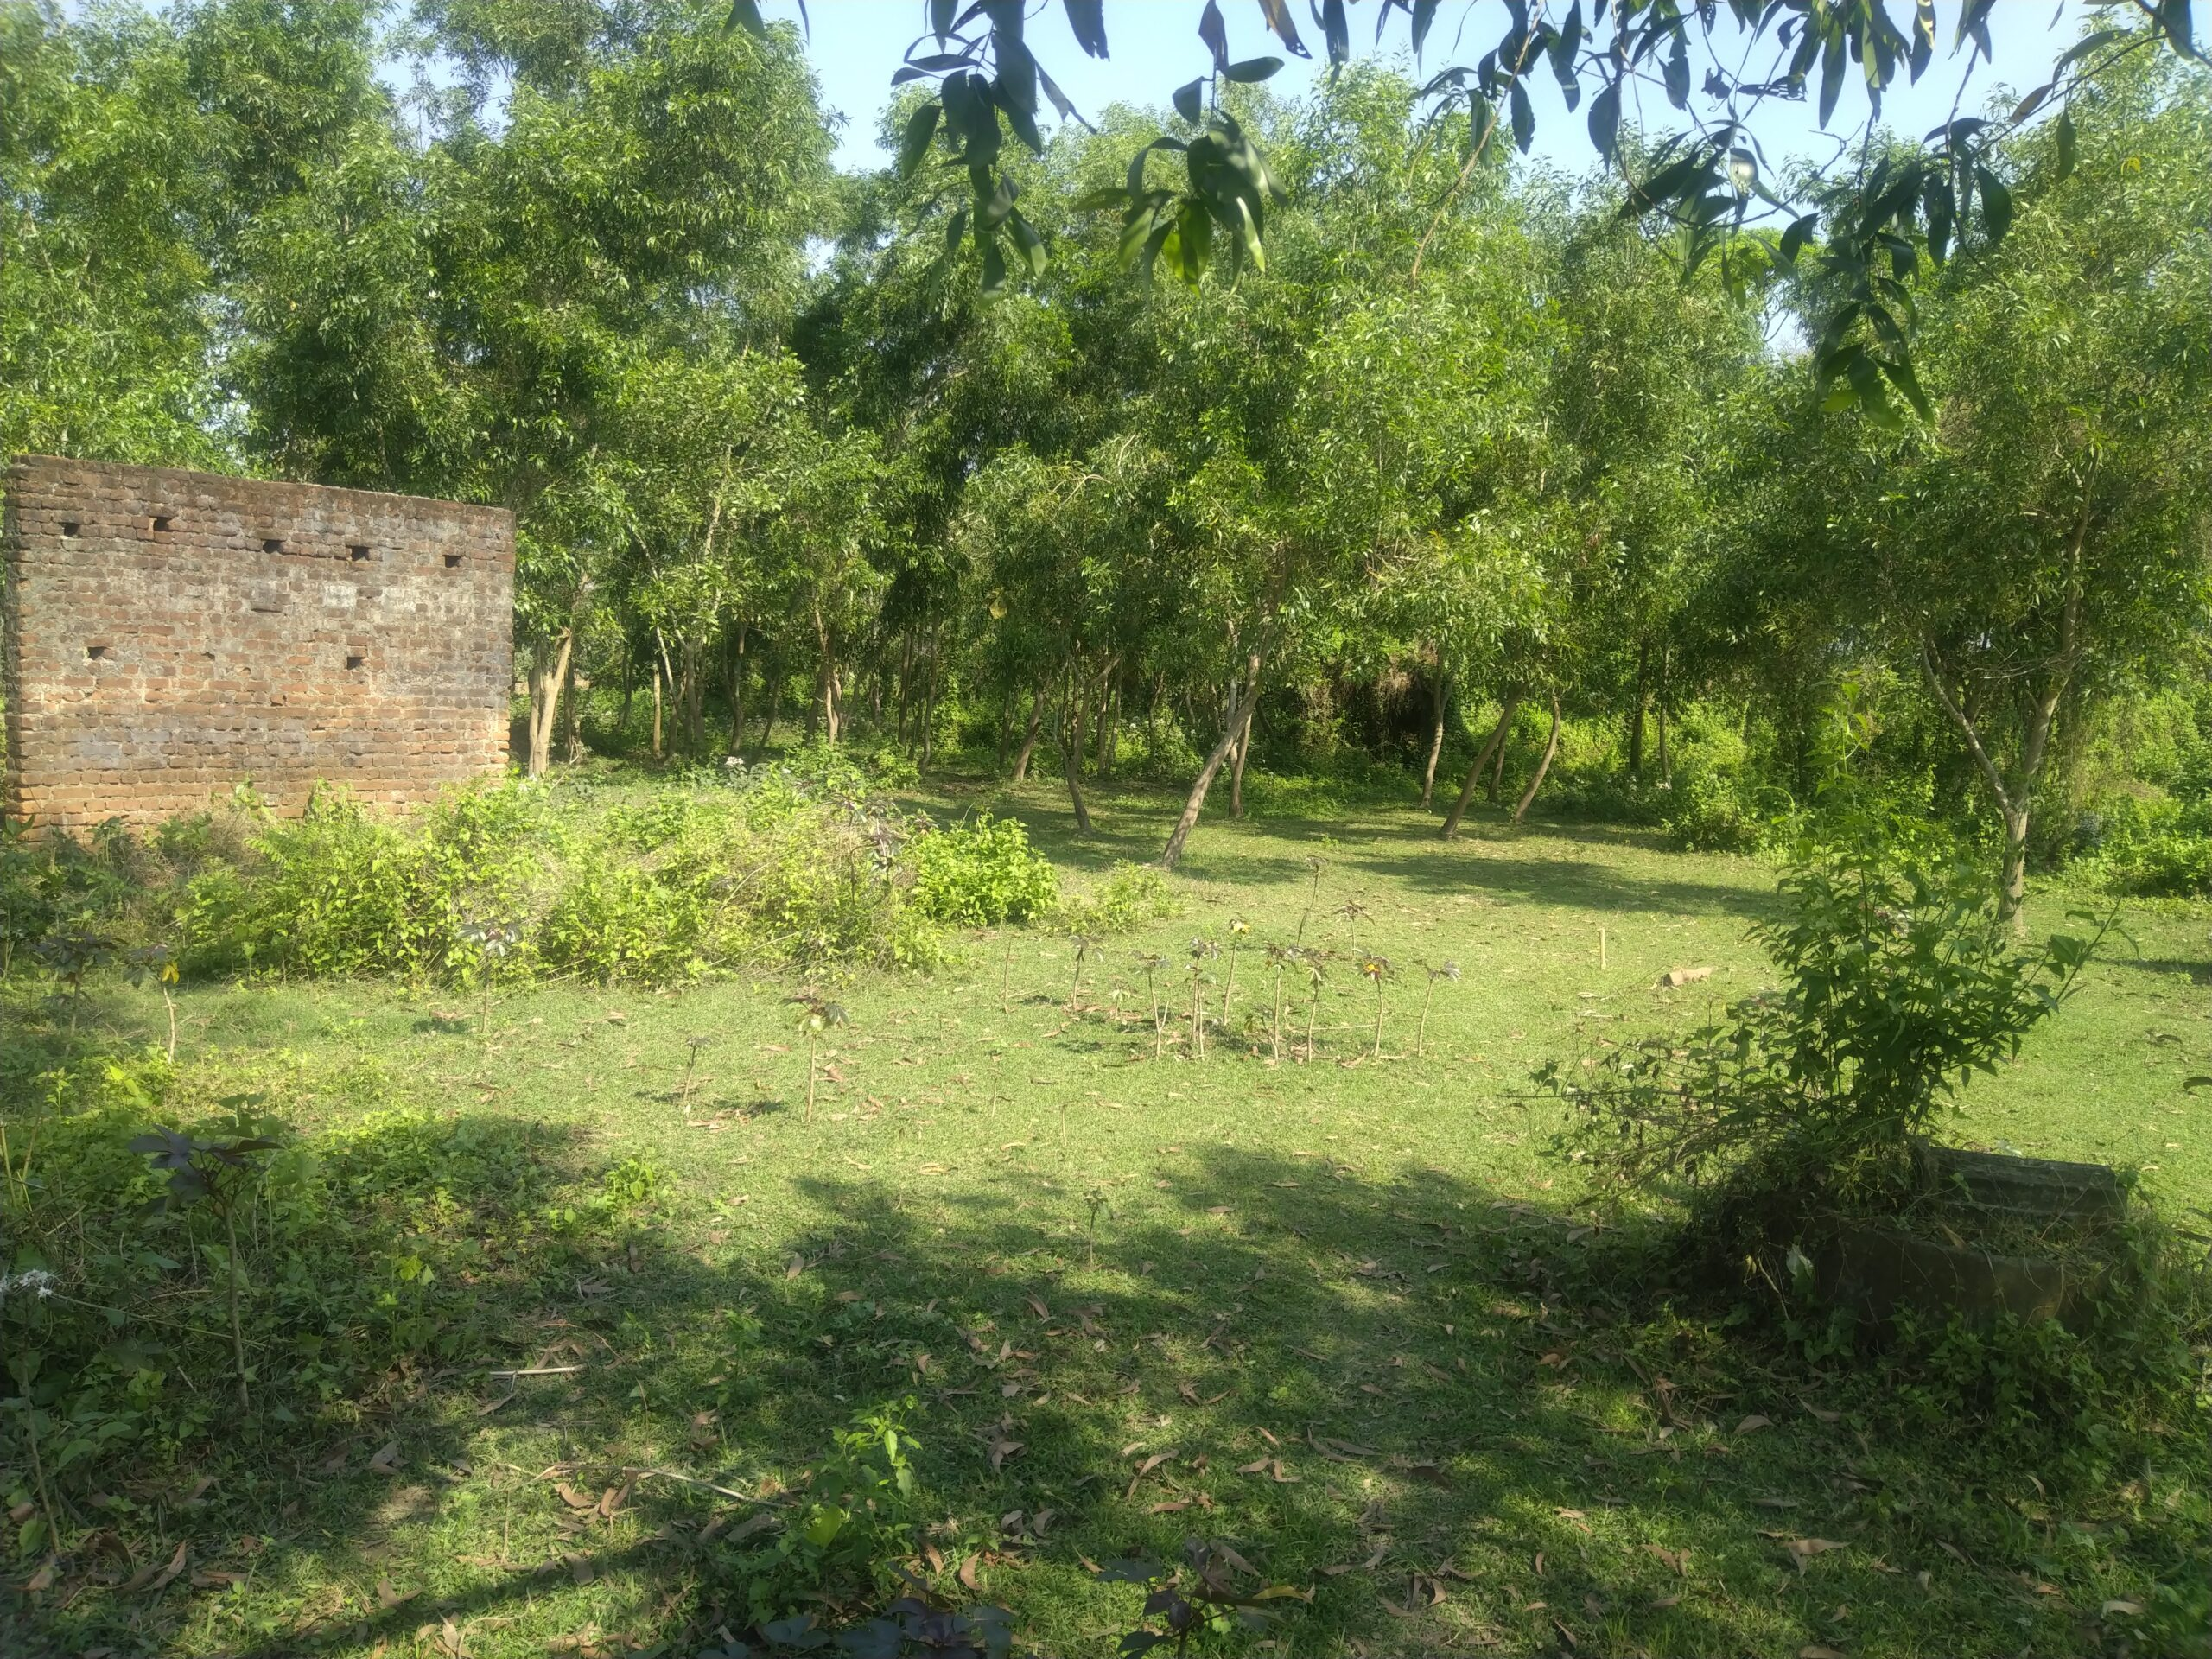 Village Chhoti in Odisha, India